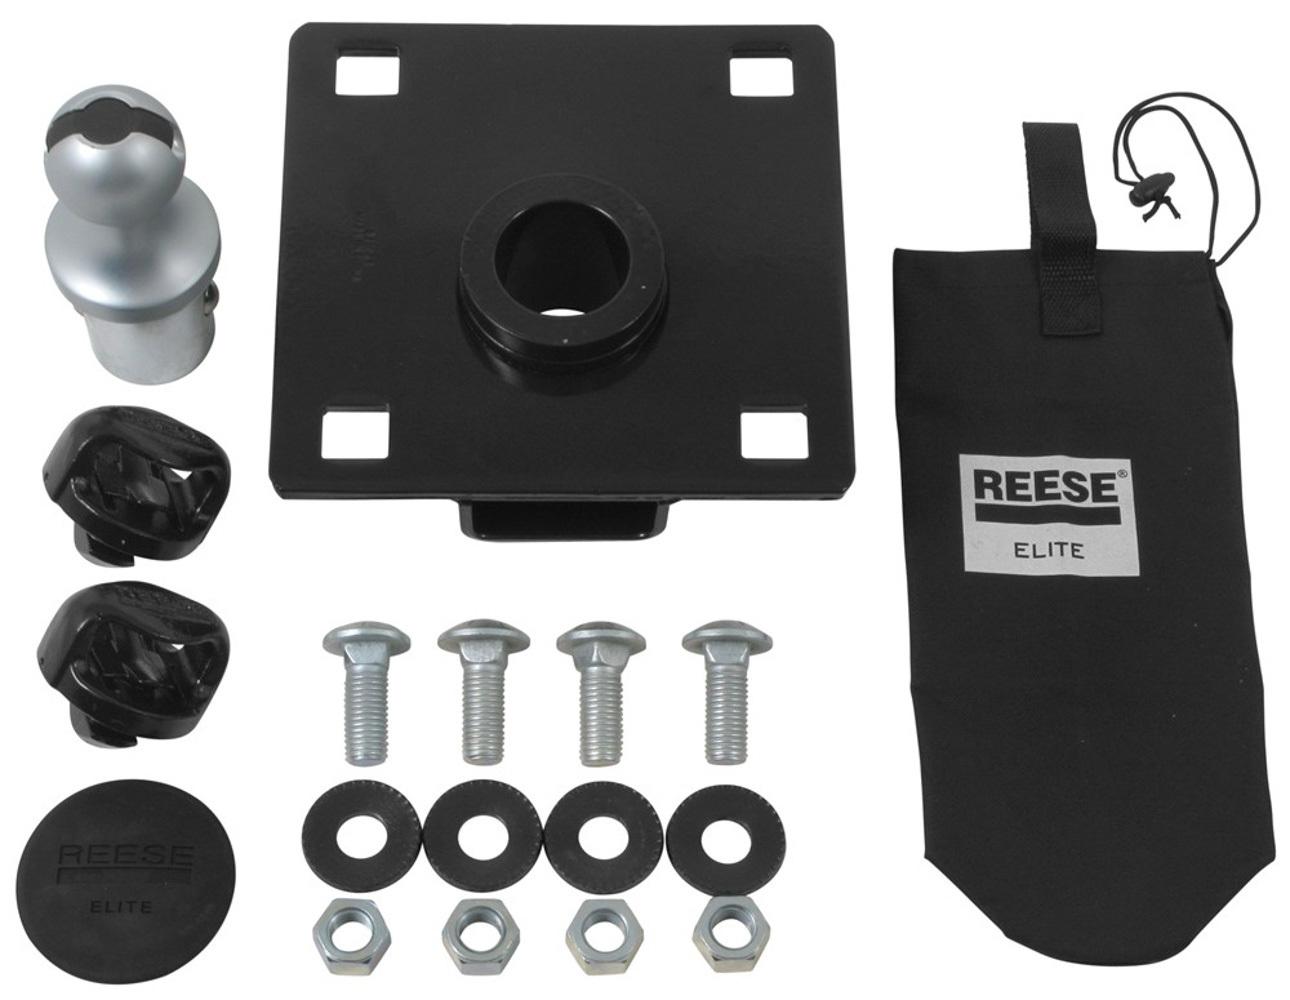 Reese Elite Series Under-Bed B olt-On Gooseneck Head wi